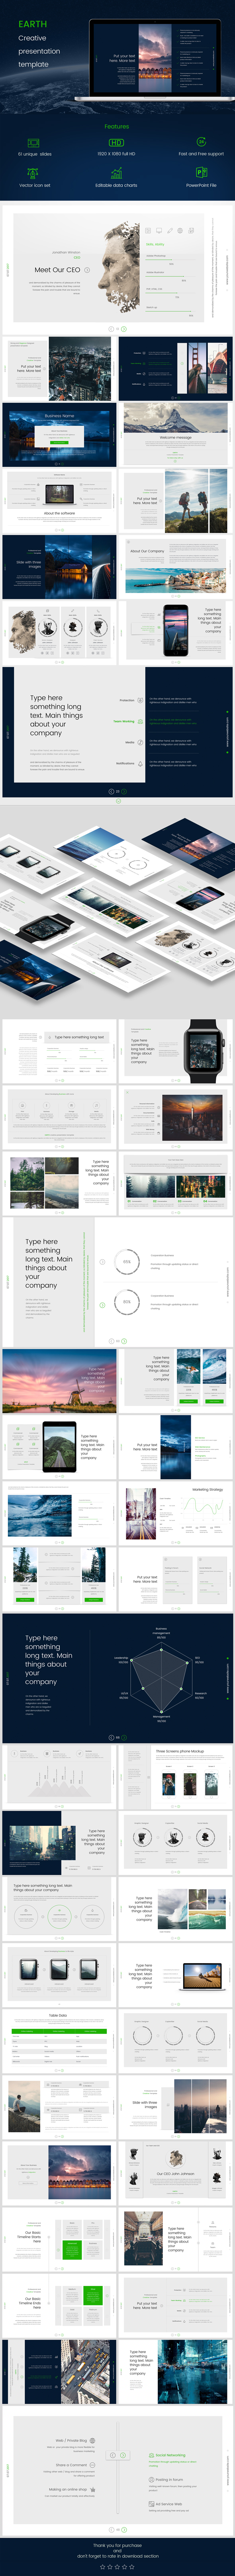 Earth PowerPoint - PowerPoint Templates Presentation Templates